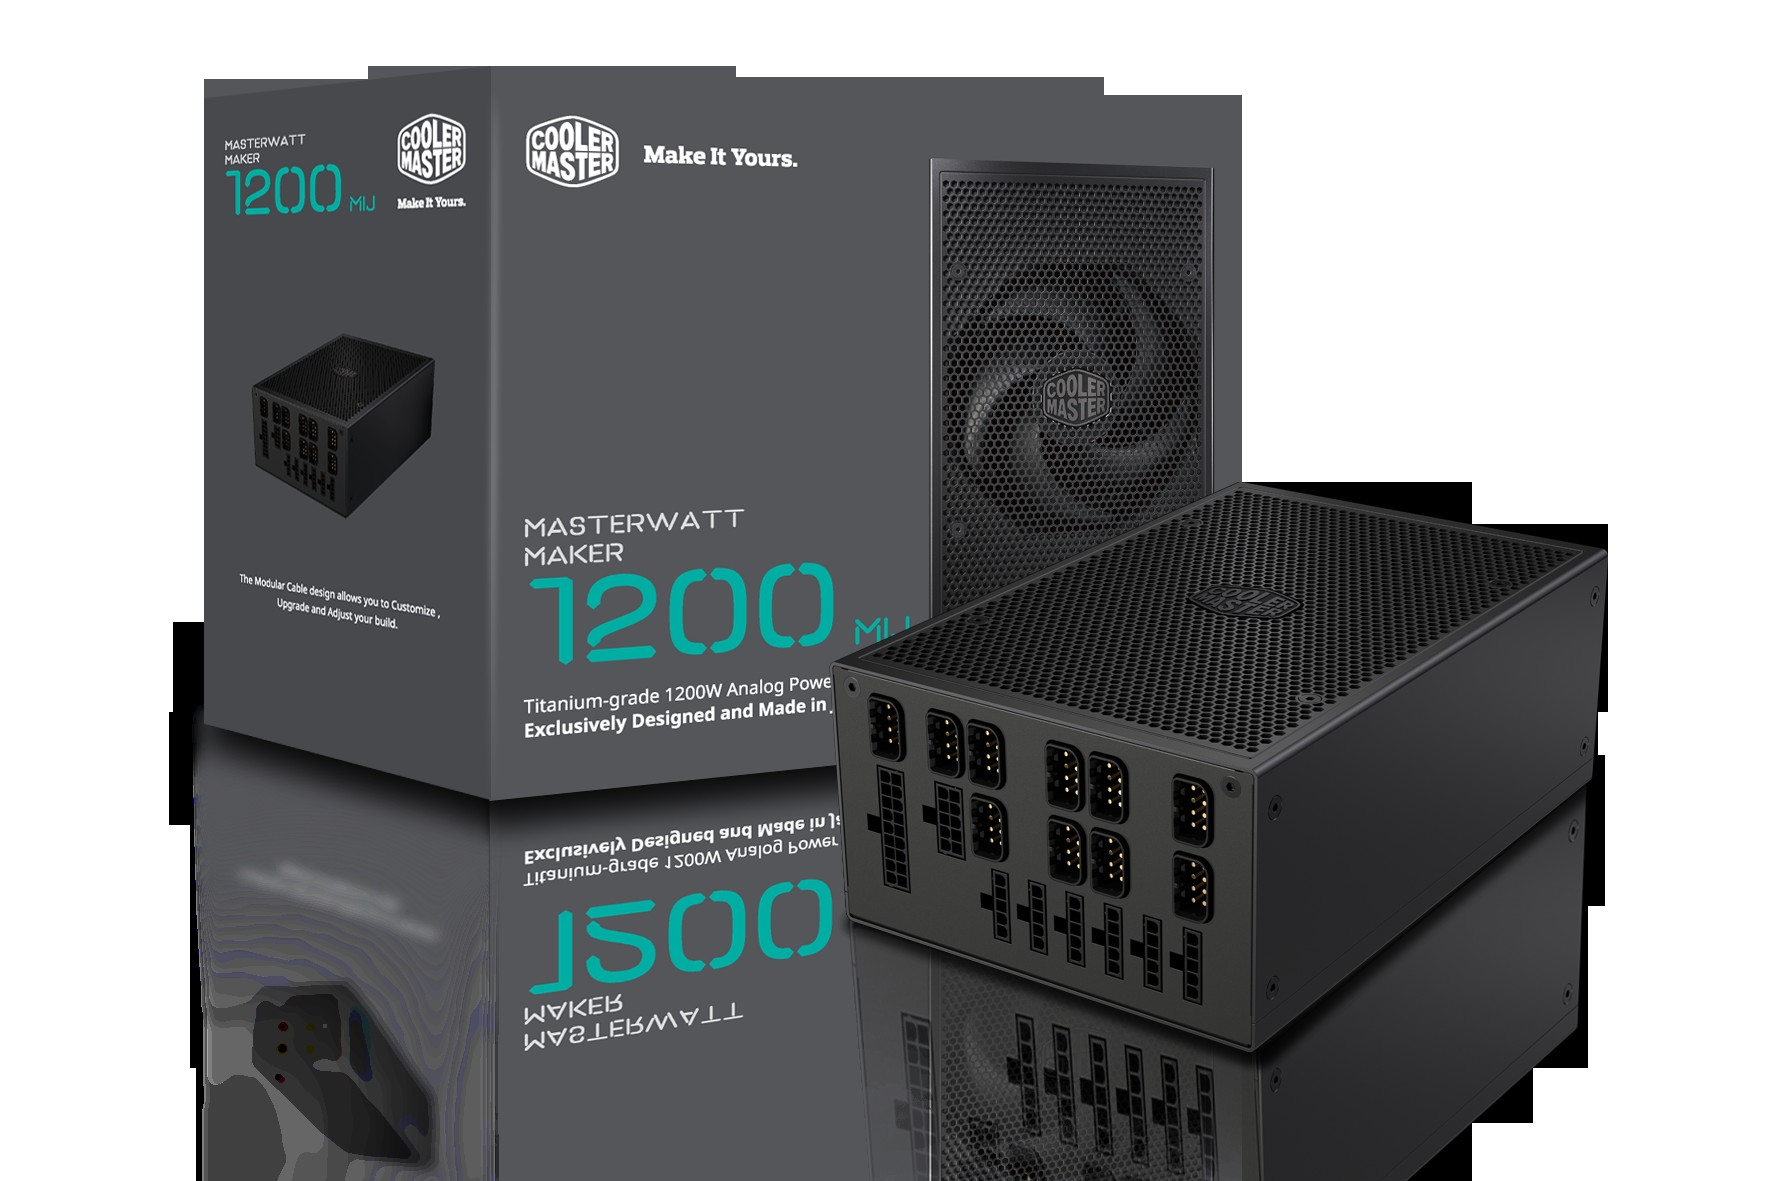 Cooler Master annonce la MasterWatt Maker 1200 MIJ